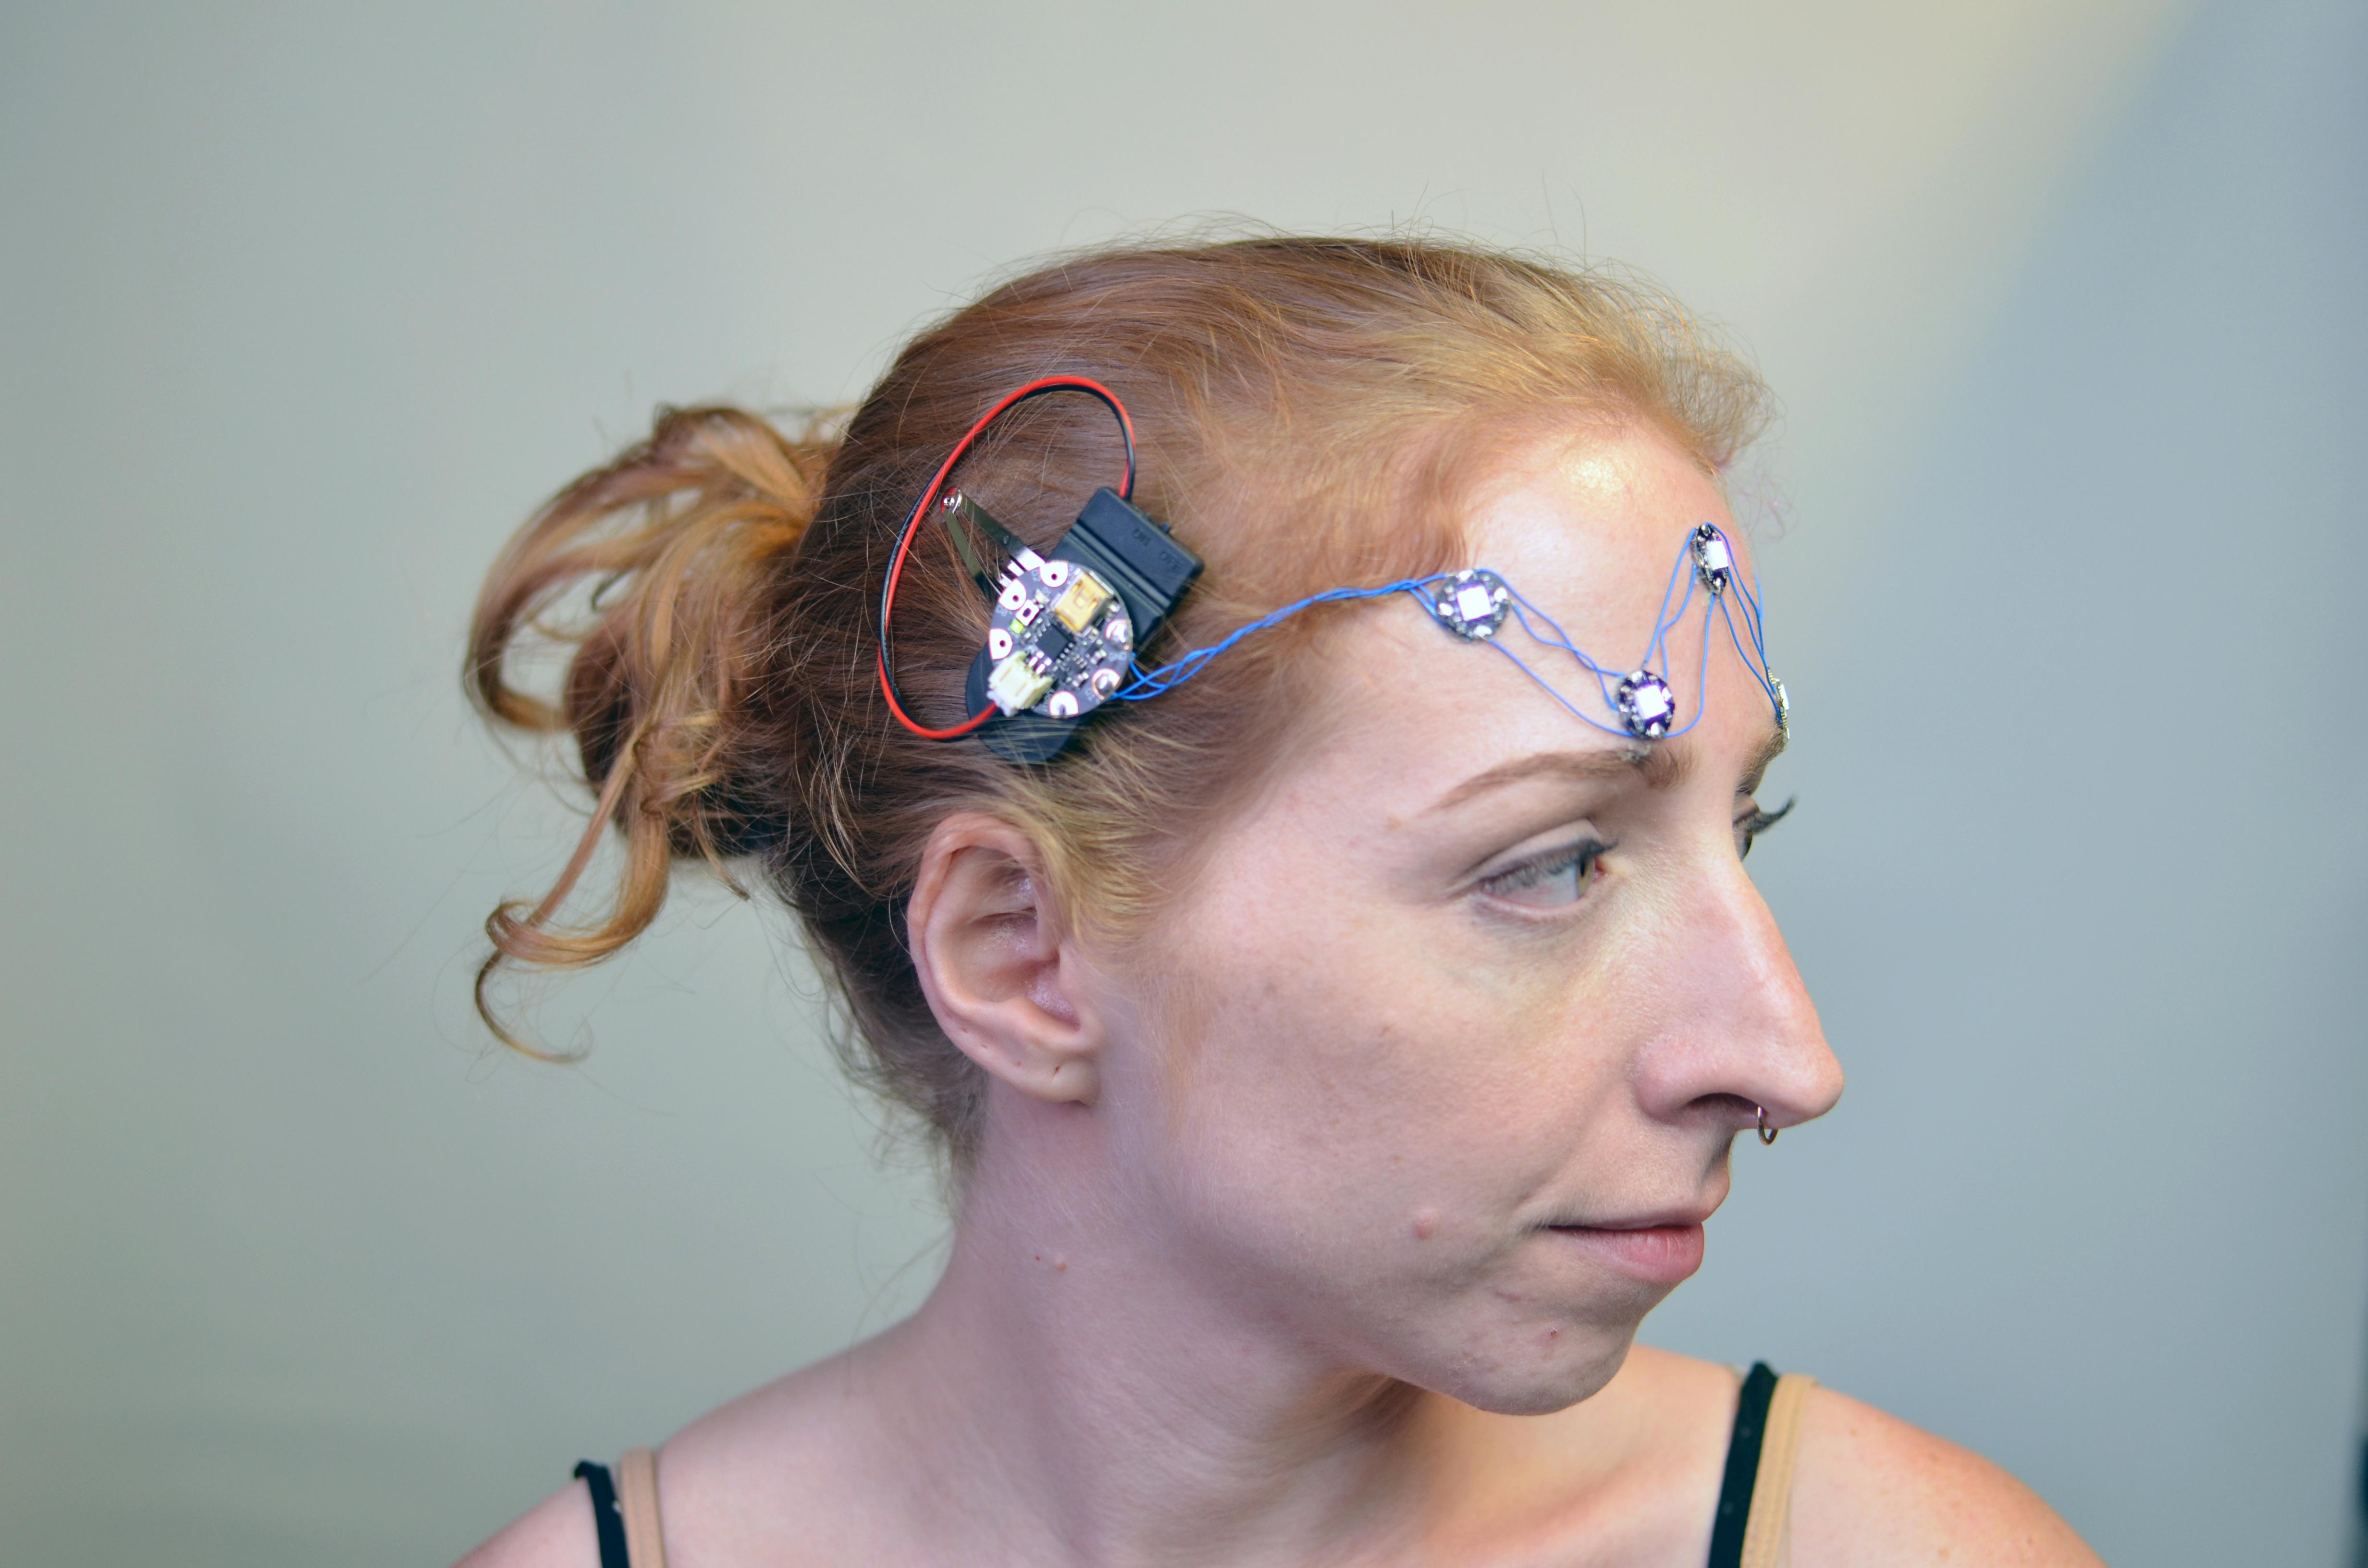 flora_space-face-LED-galaxy-makeup-07.jpg